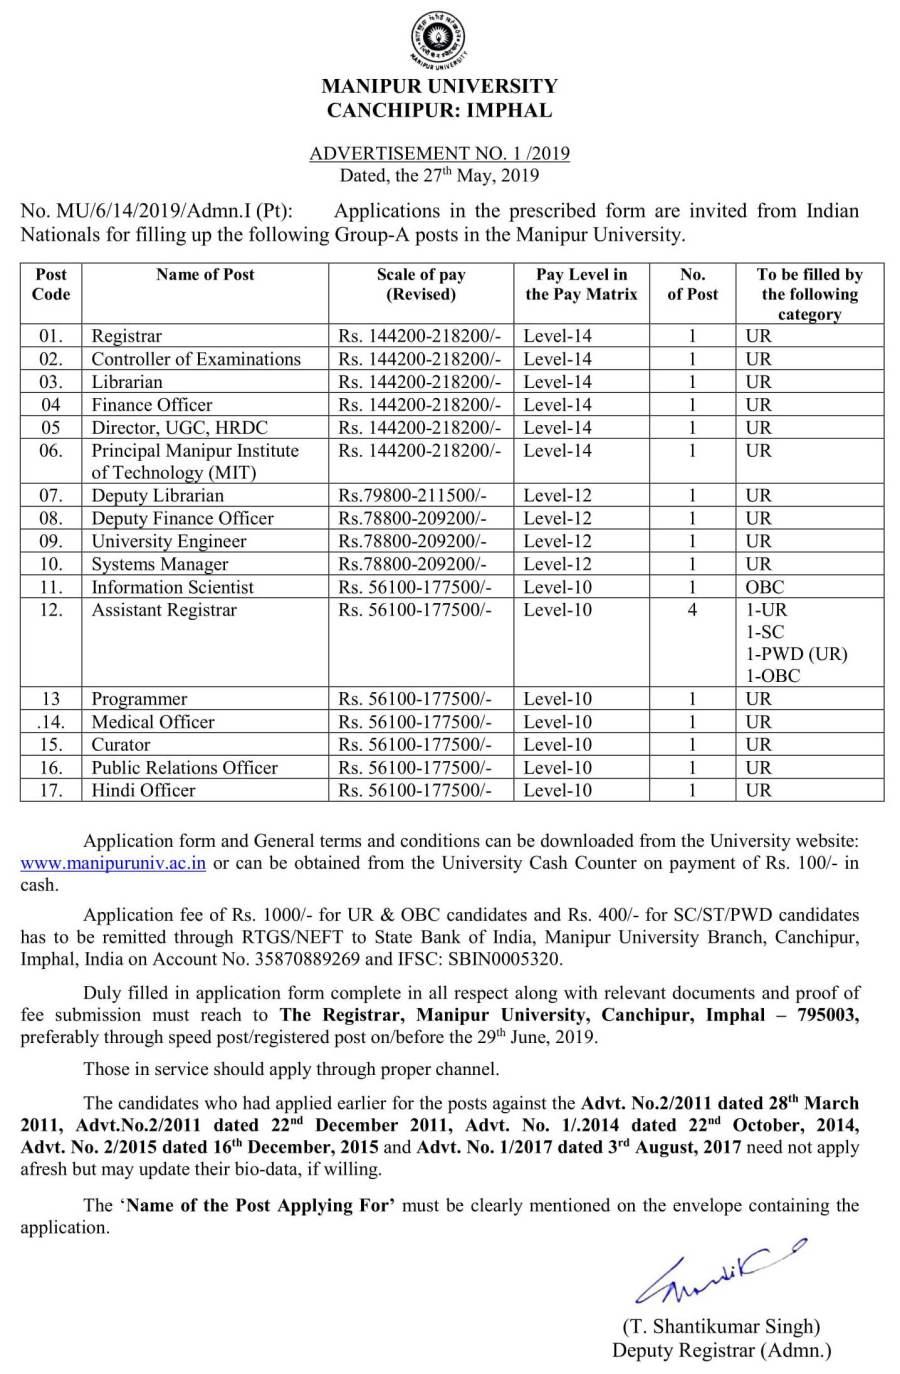 RecruitmentGA12019-01.jpg